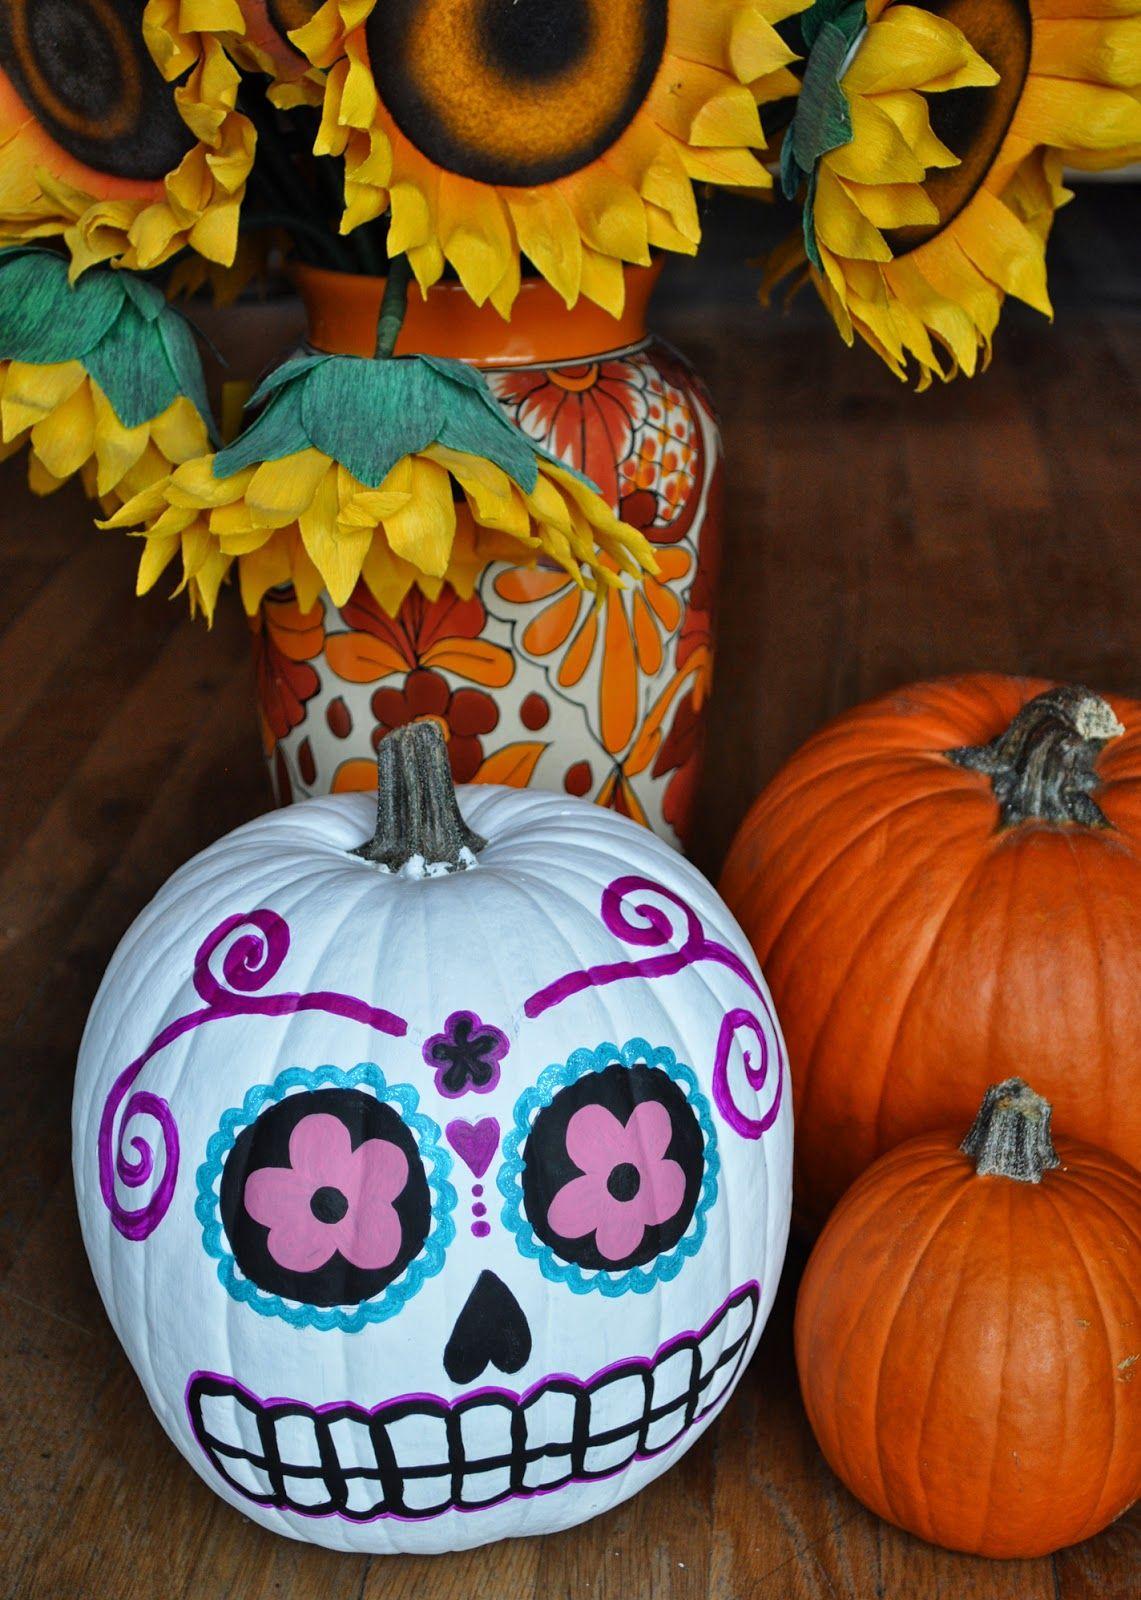 Mini pumpkin decorating ideas - Day Of The Dead Sugar Skull Pumpkins